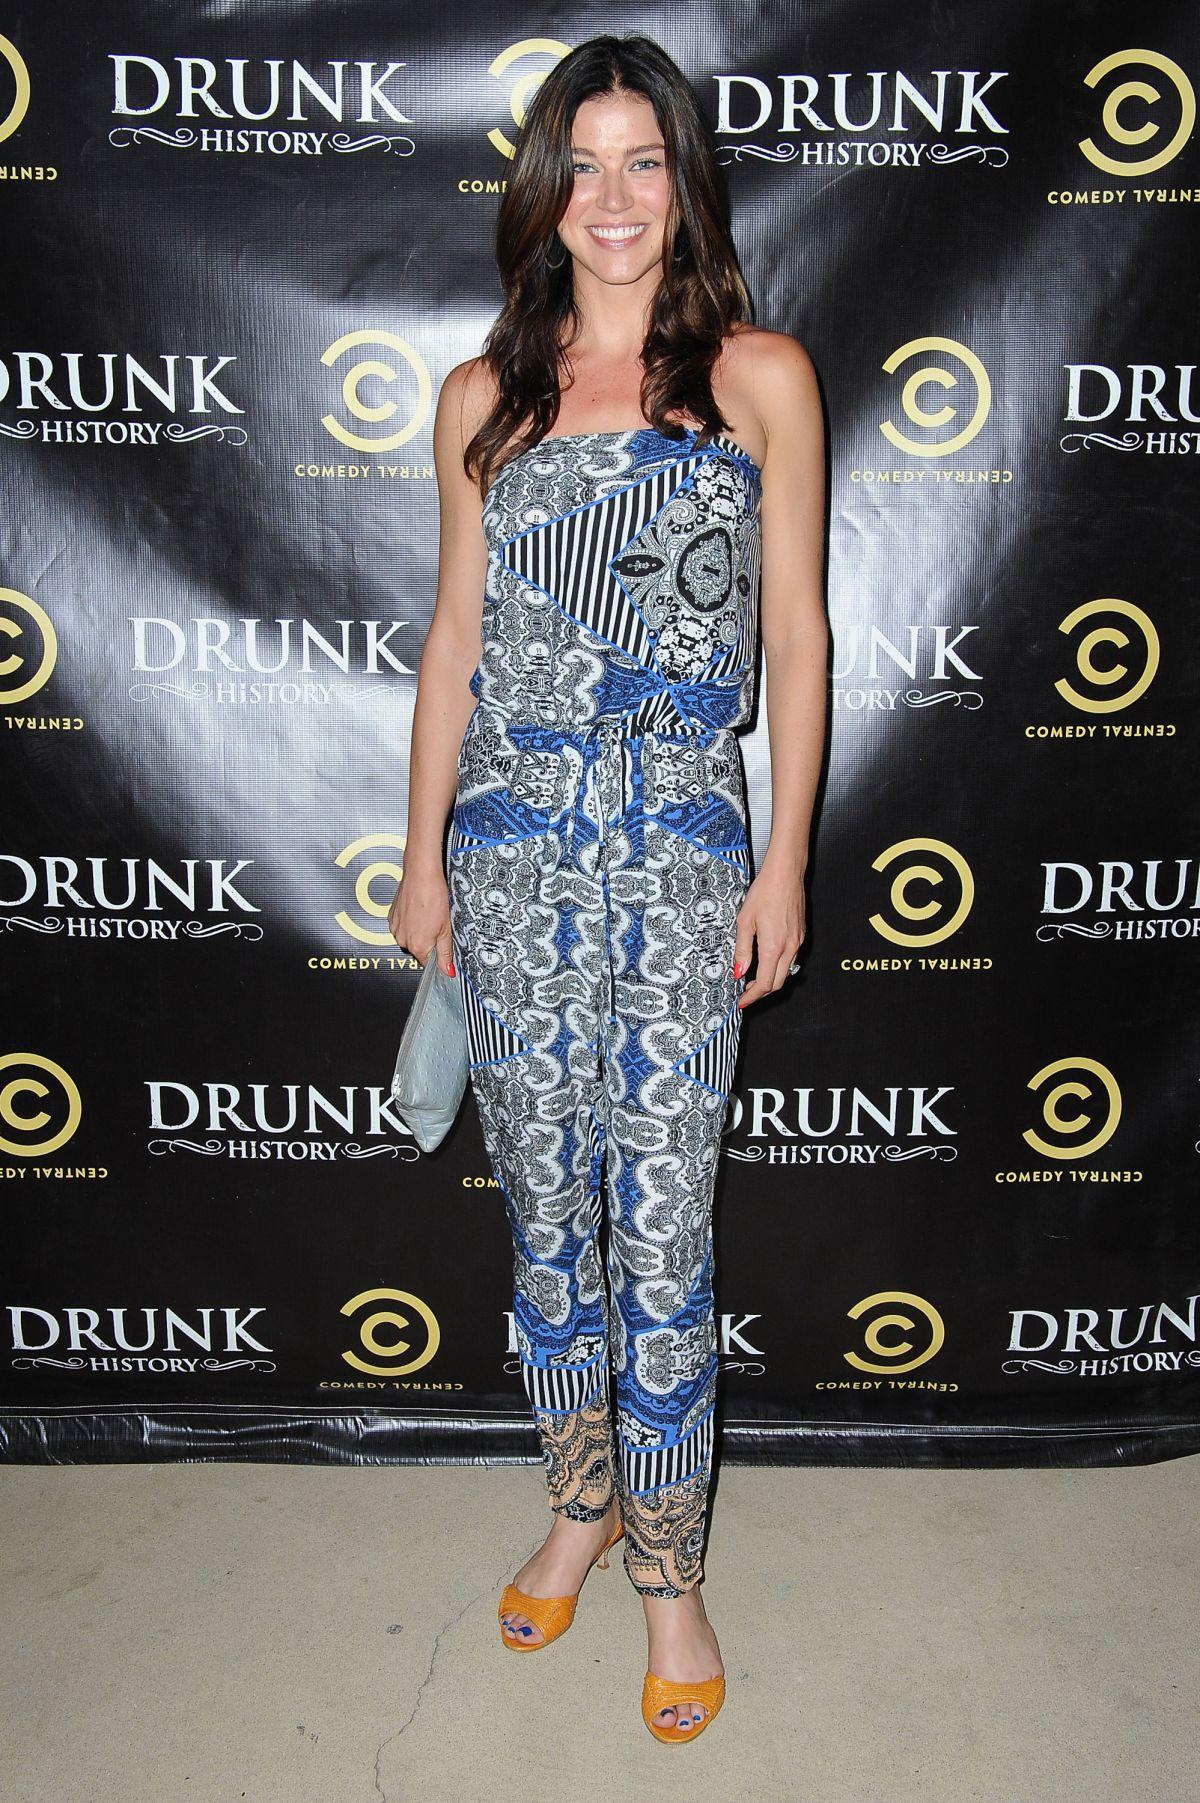 ADRIANNE PALICKI at Drunk History Season 2 Premiere Party in Glendale